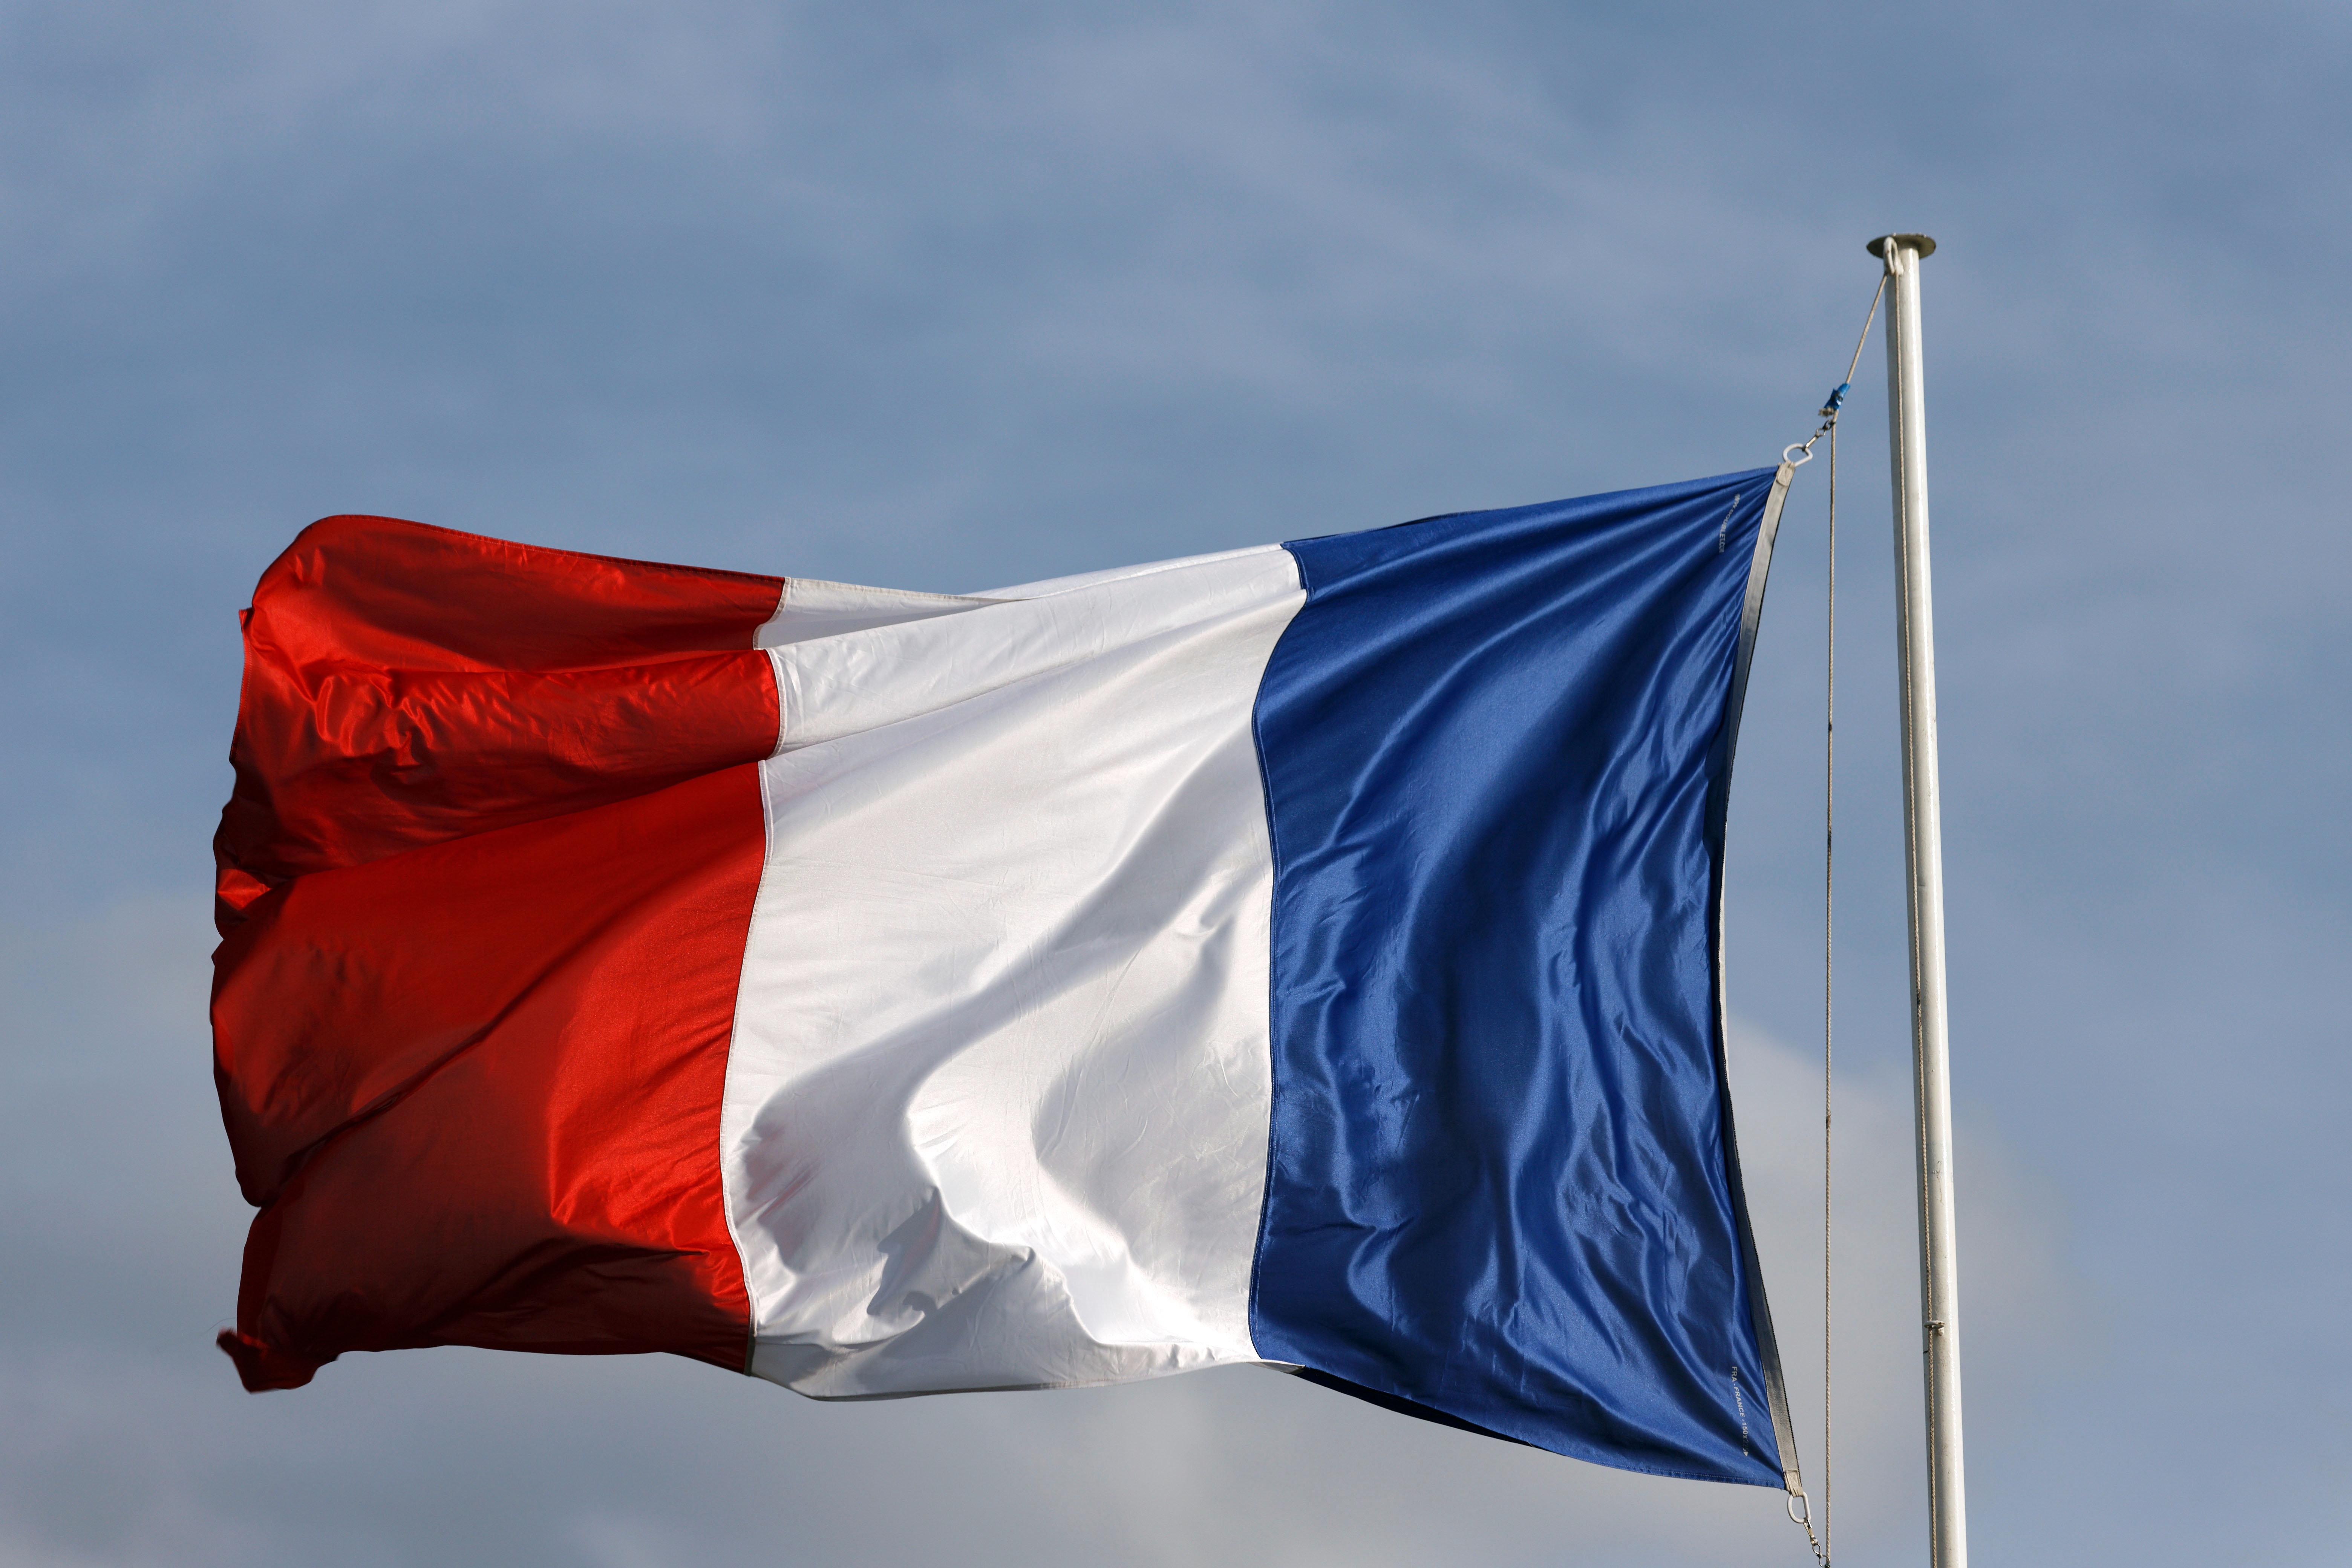 Projet d'attentat en France: l'Iran dément les accusations de Paris